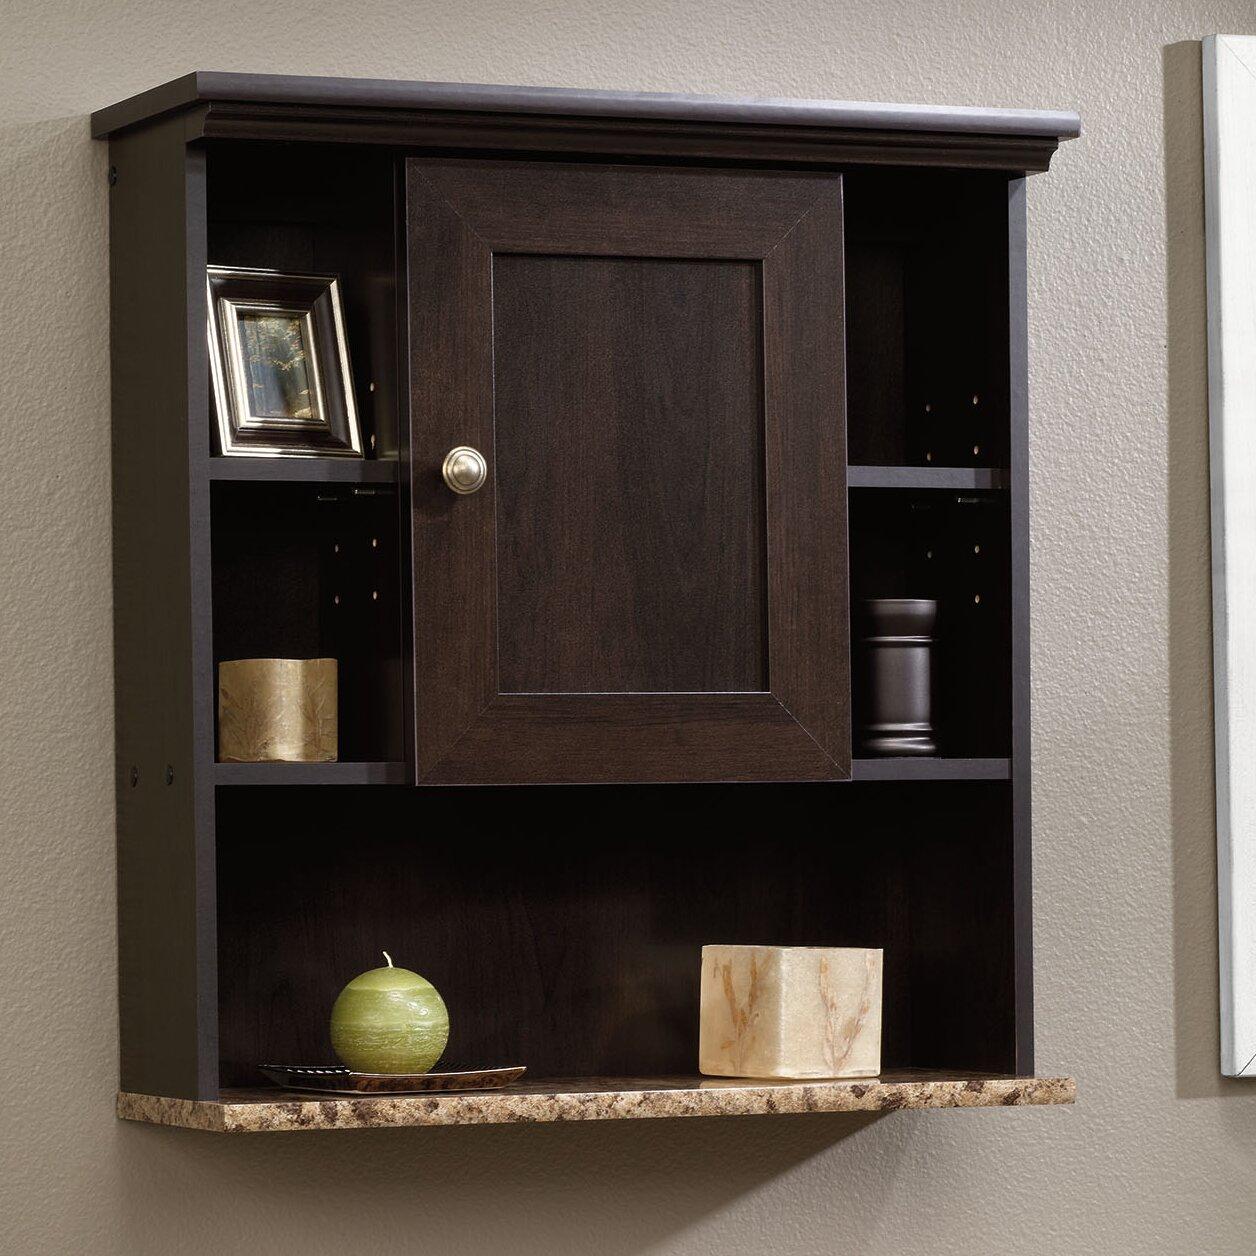 sauder peppercorn w x h wall mounted cabinet. Black Bedroom Furniture Sets. Home Design Ideas